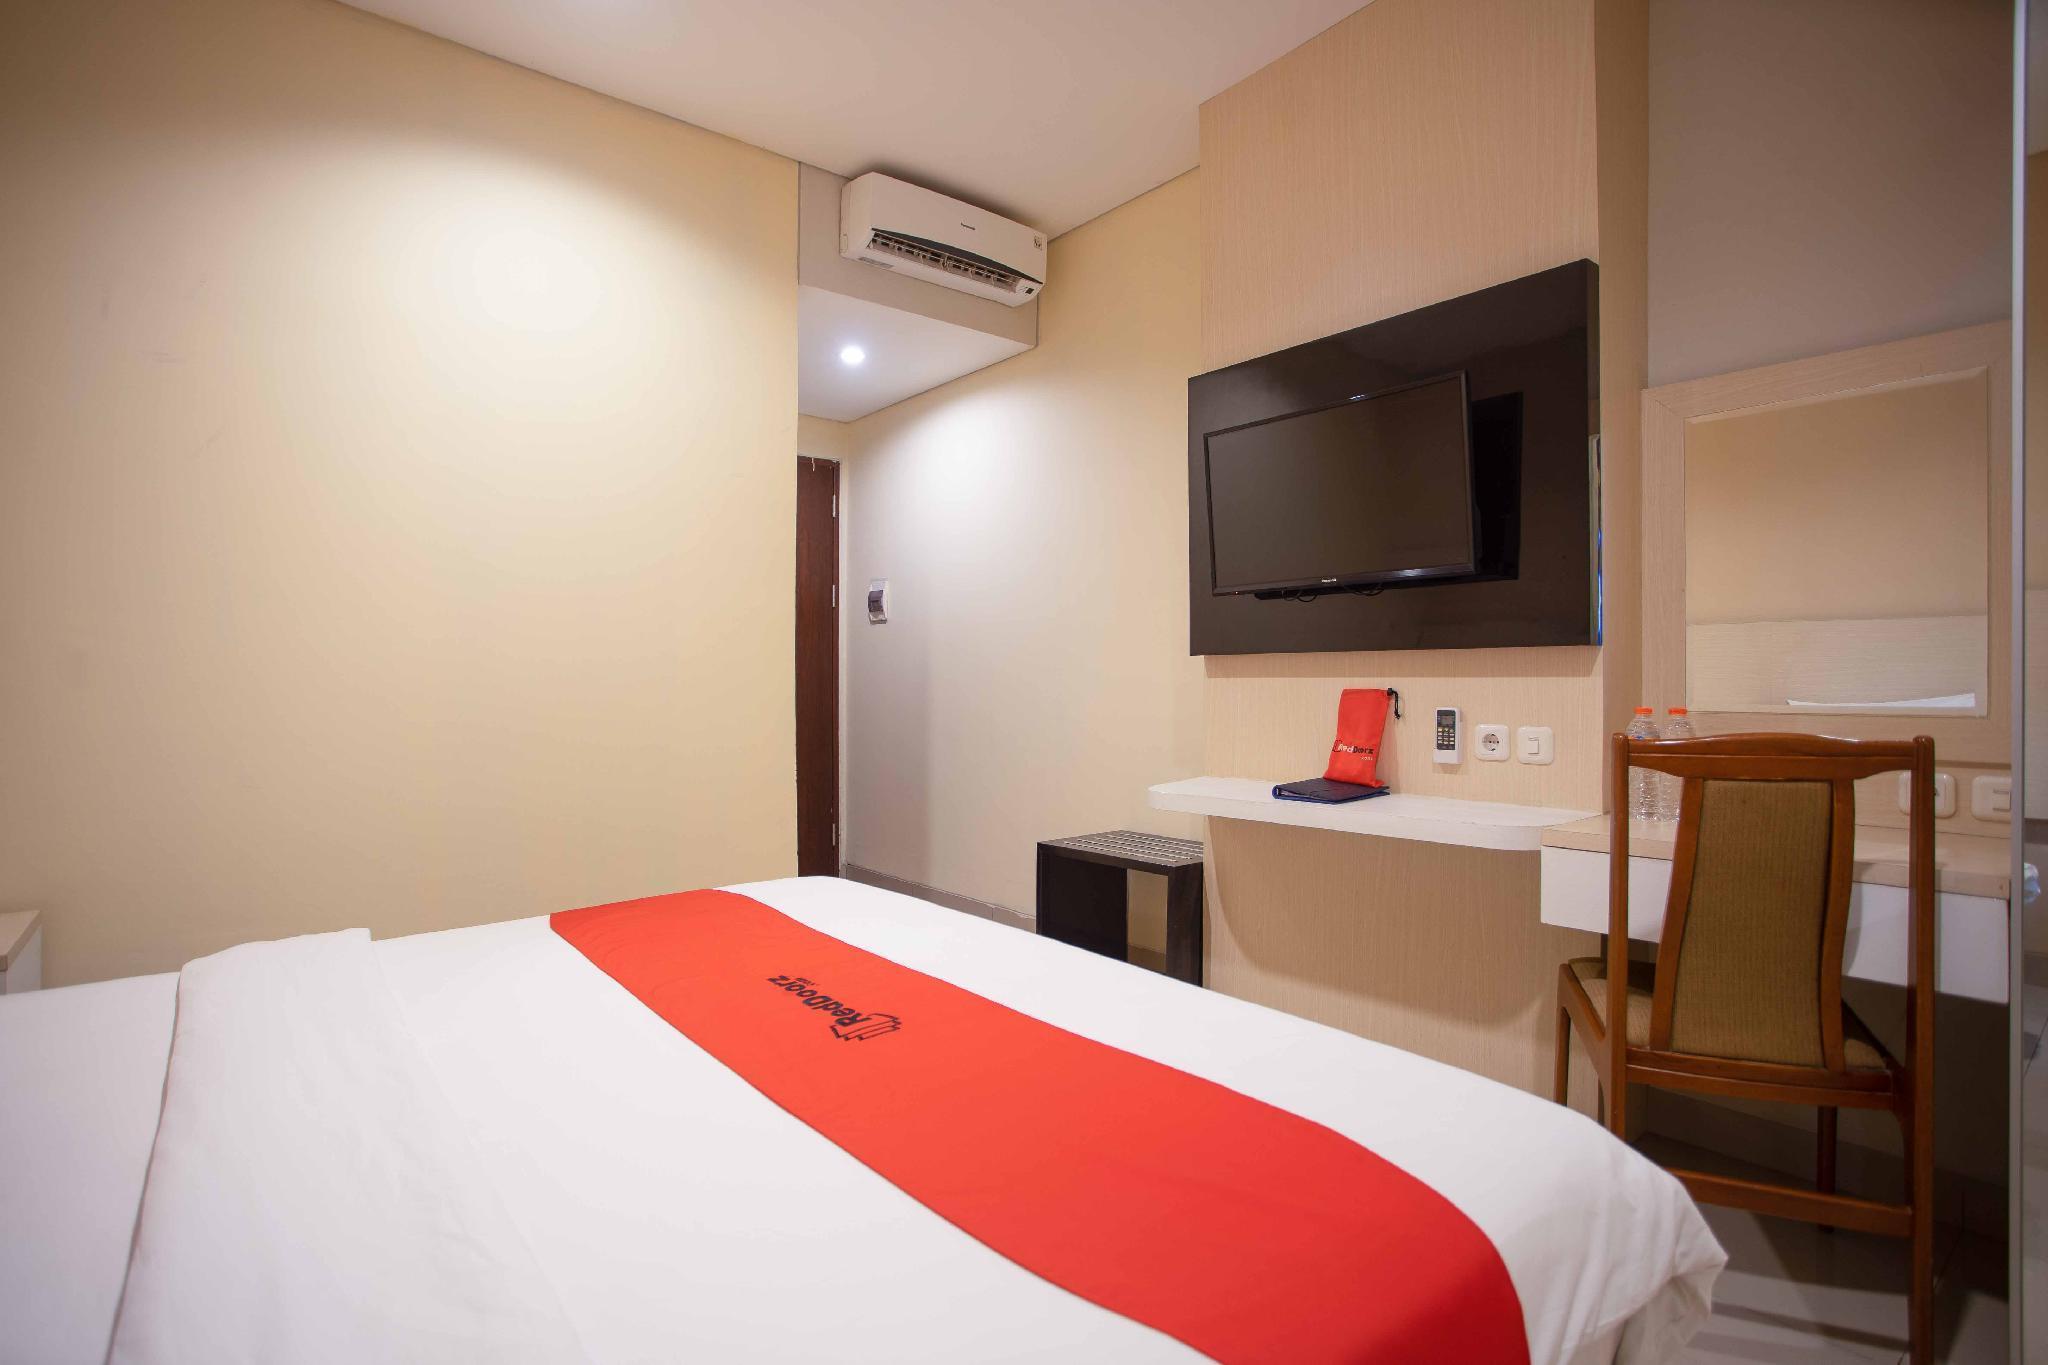 Reviews RedDoorz Premium near Kawasan Industri Cikarang